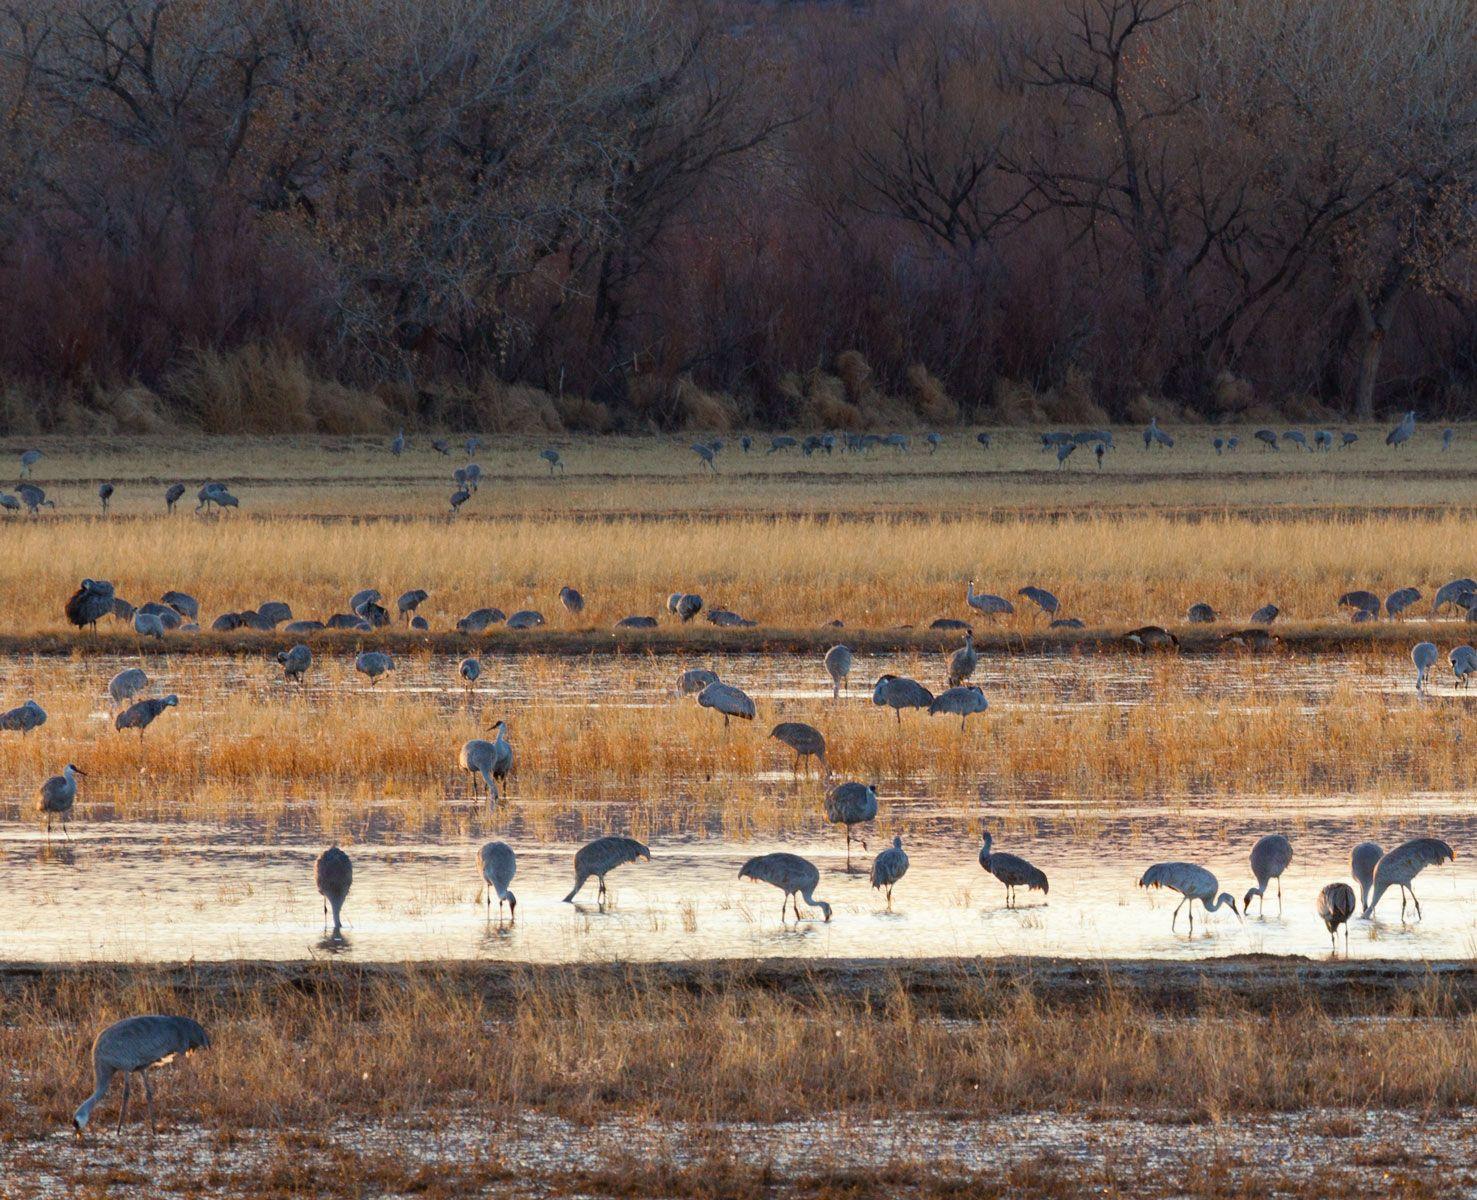 Sandhill Cranes Foraging at Dusk I, Bosque del Apache